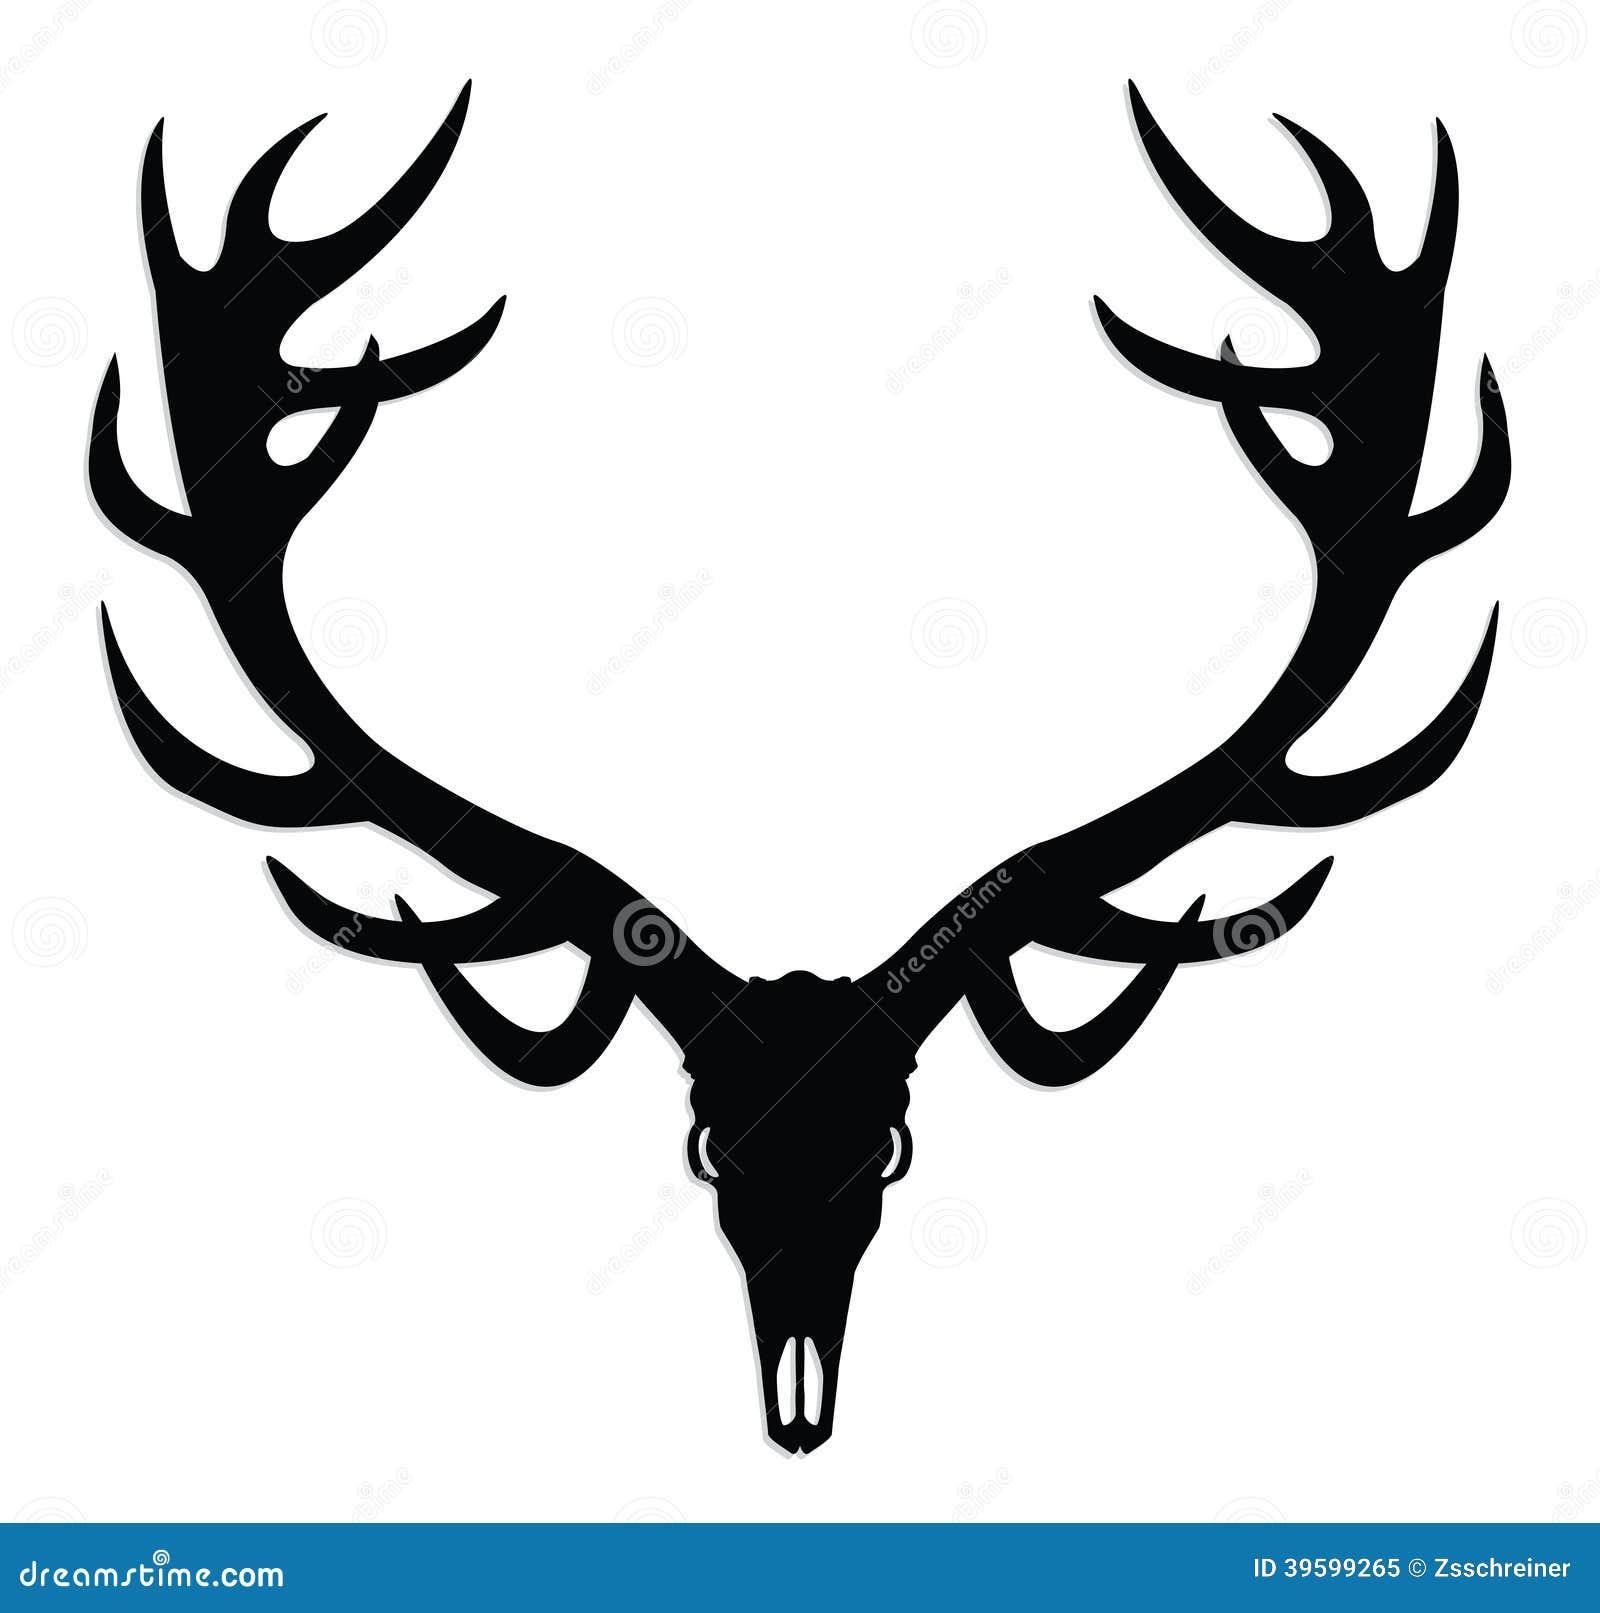 deer skull with antlers stock illustration illustration of horn rh dreamstime com deer skull mount vector deer skull vector free